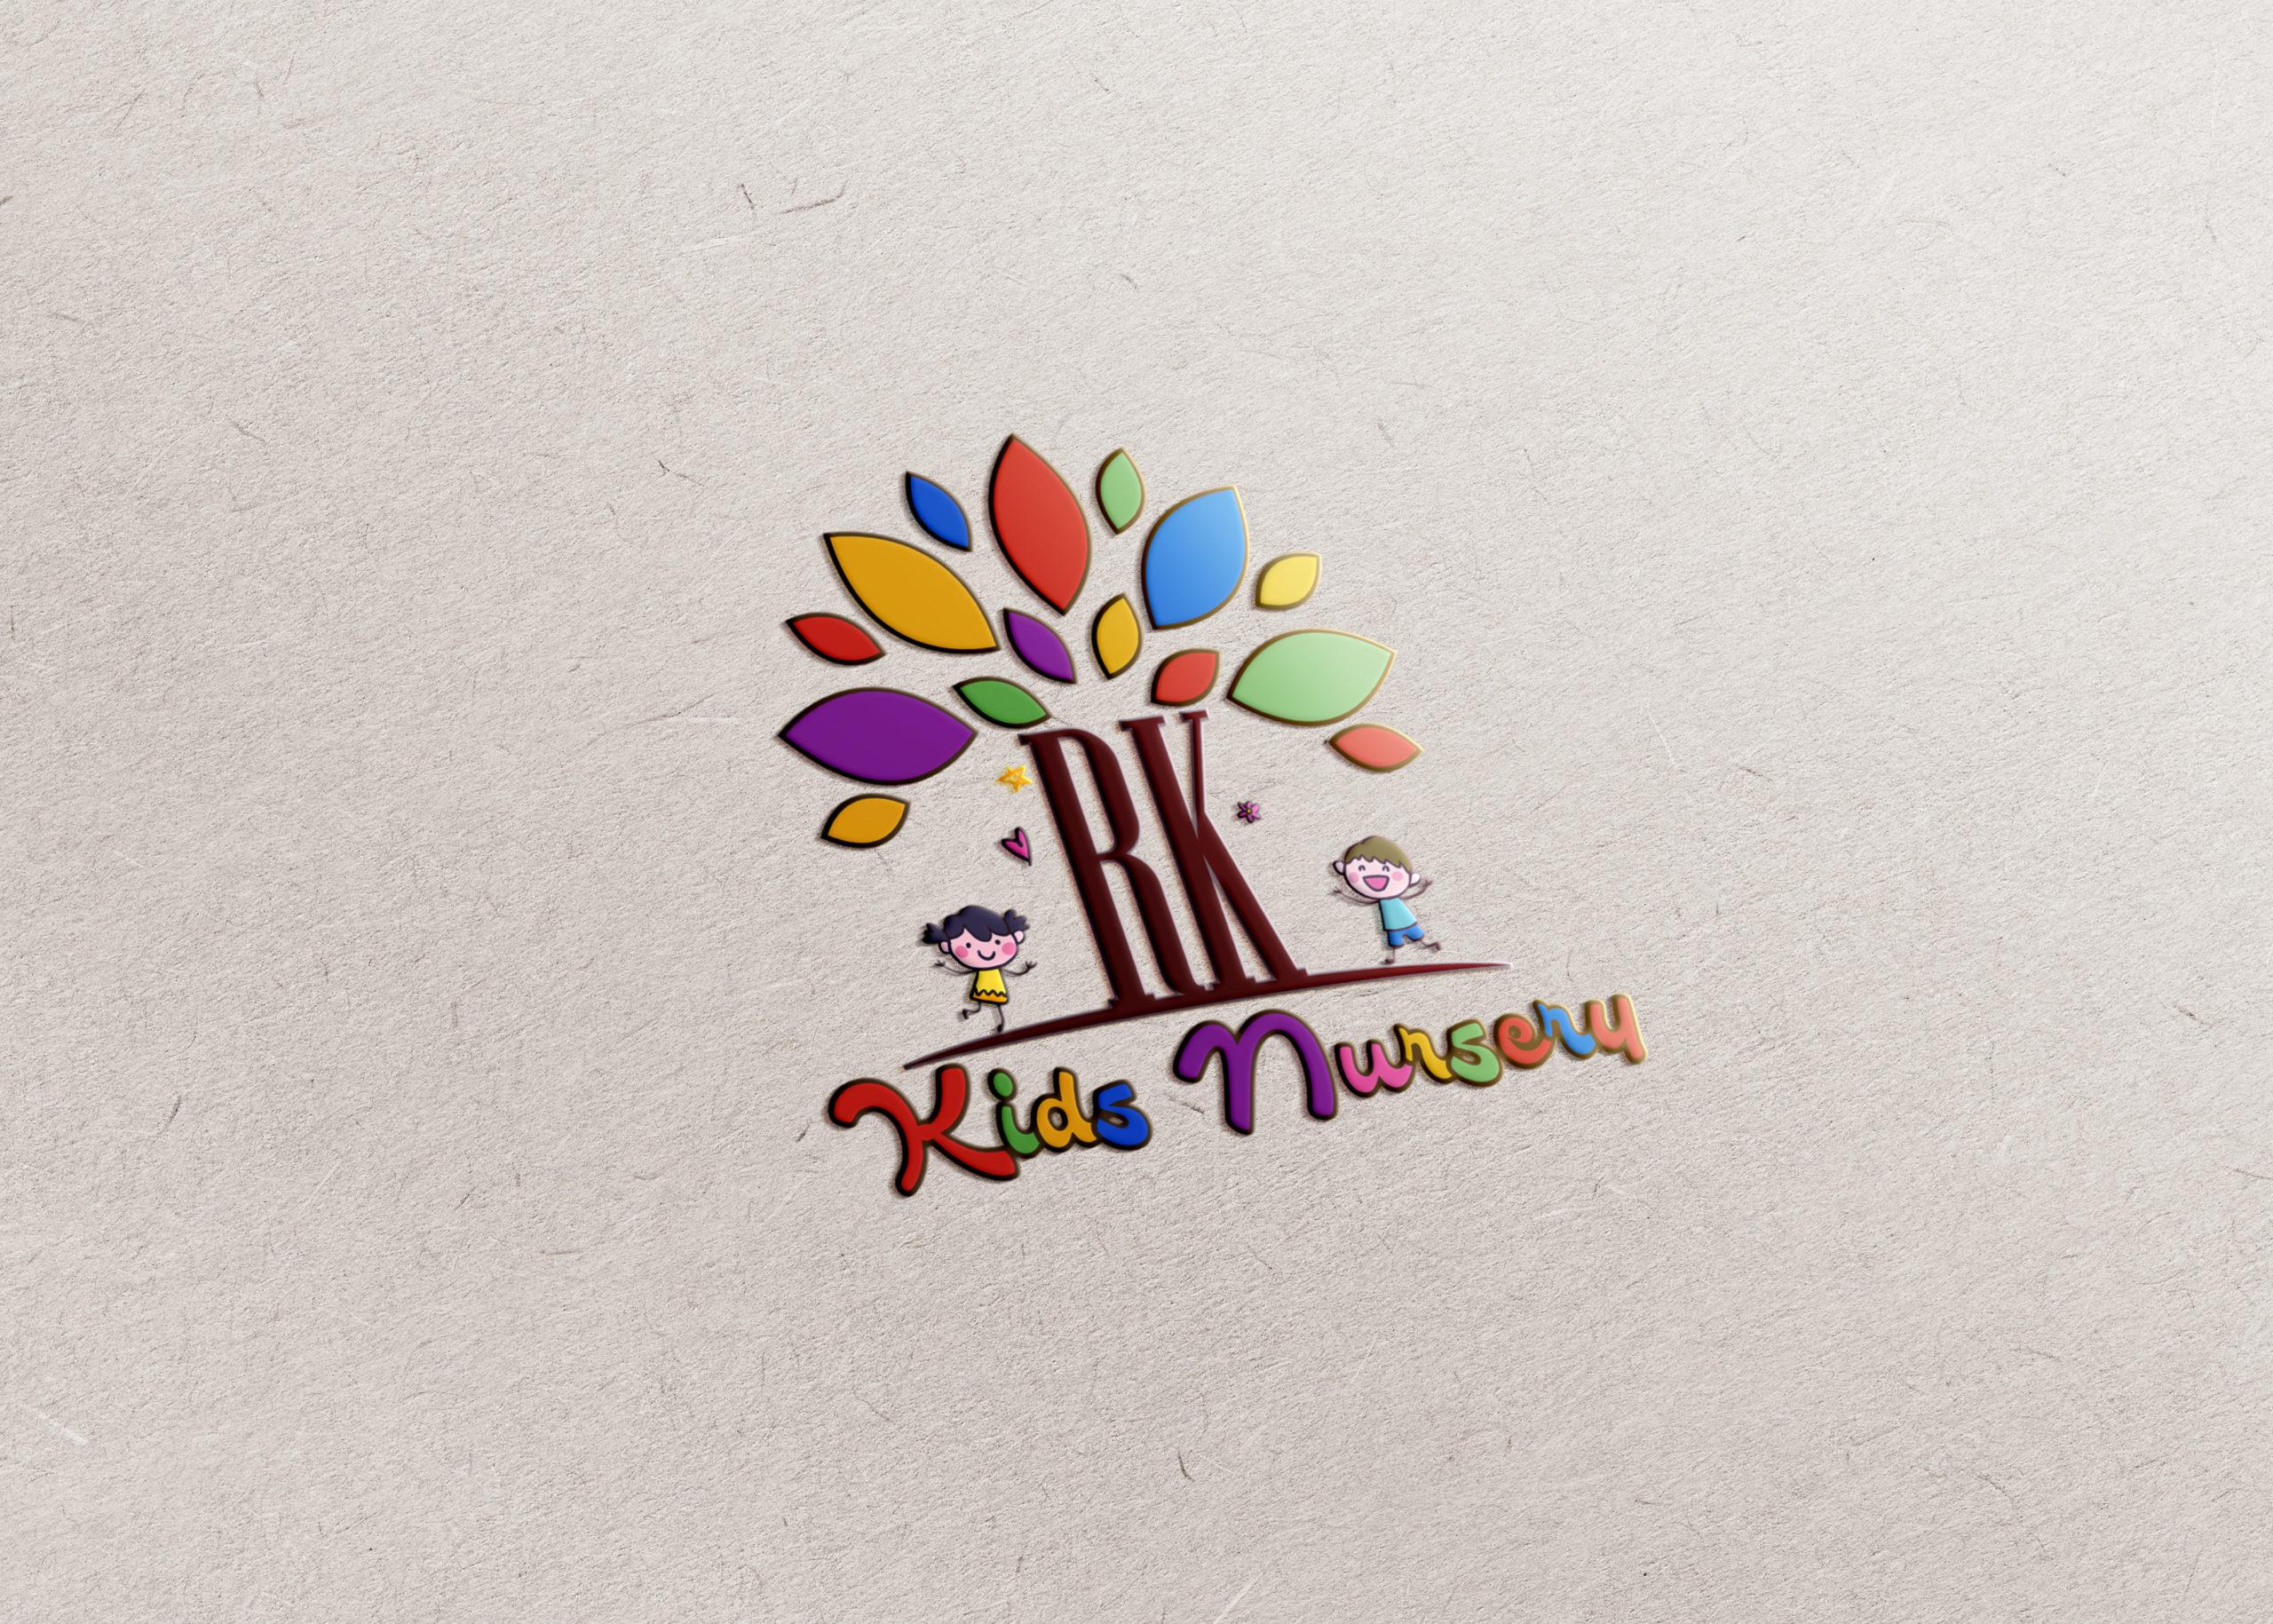 Kids Nursery logo design with children playing concept by Badri Design